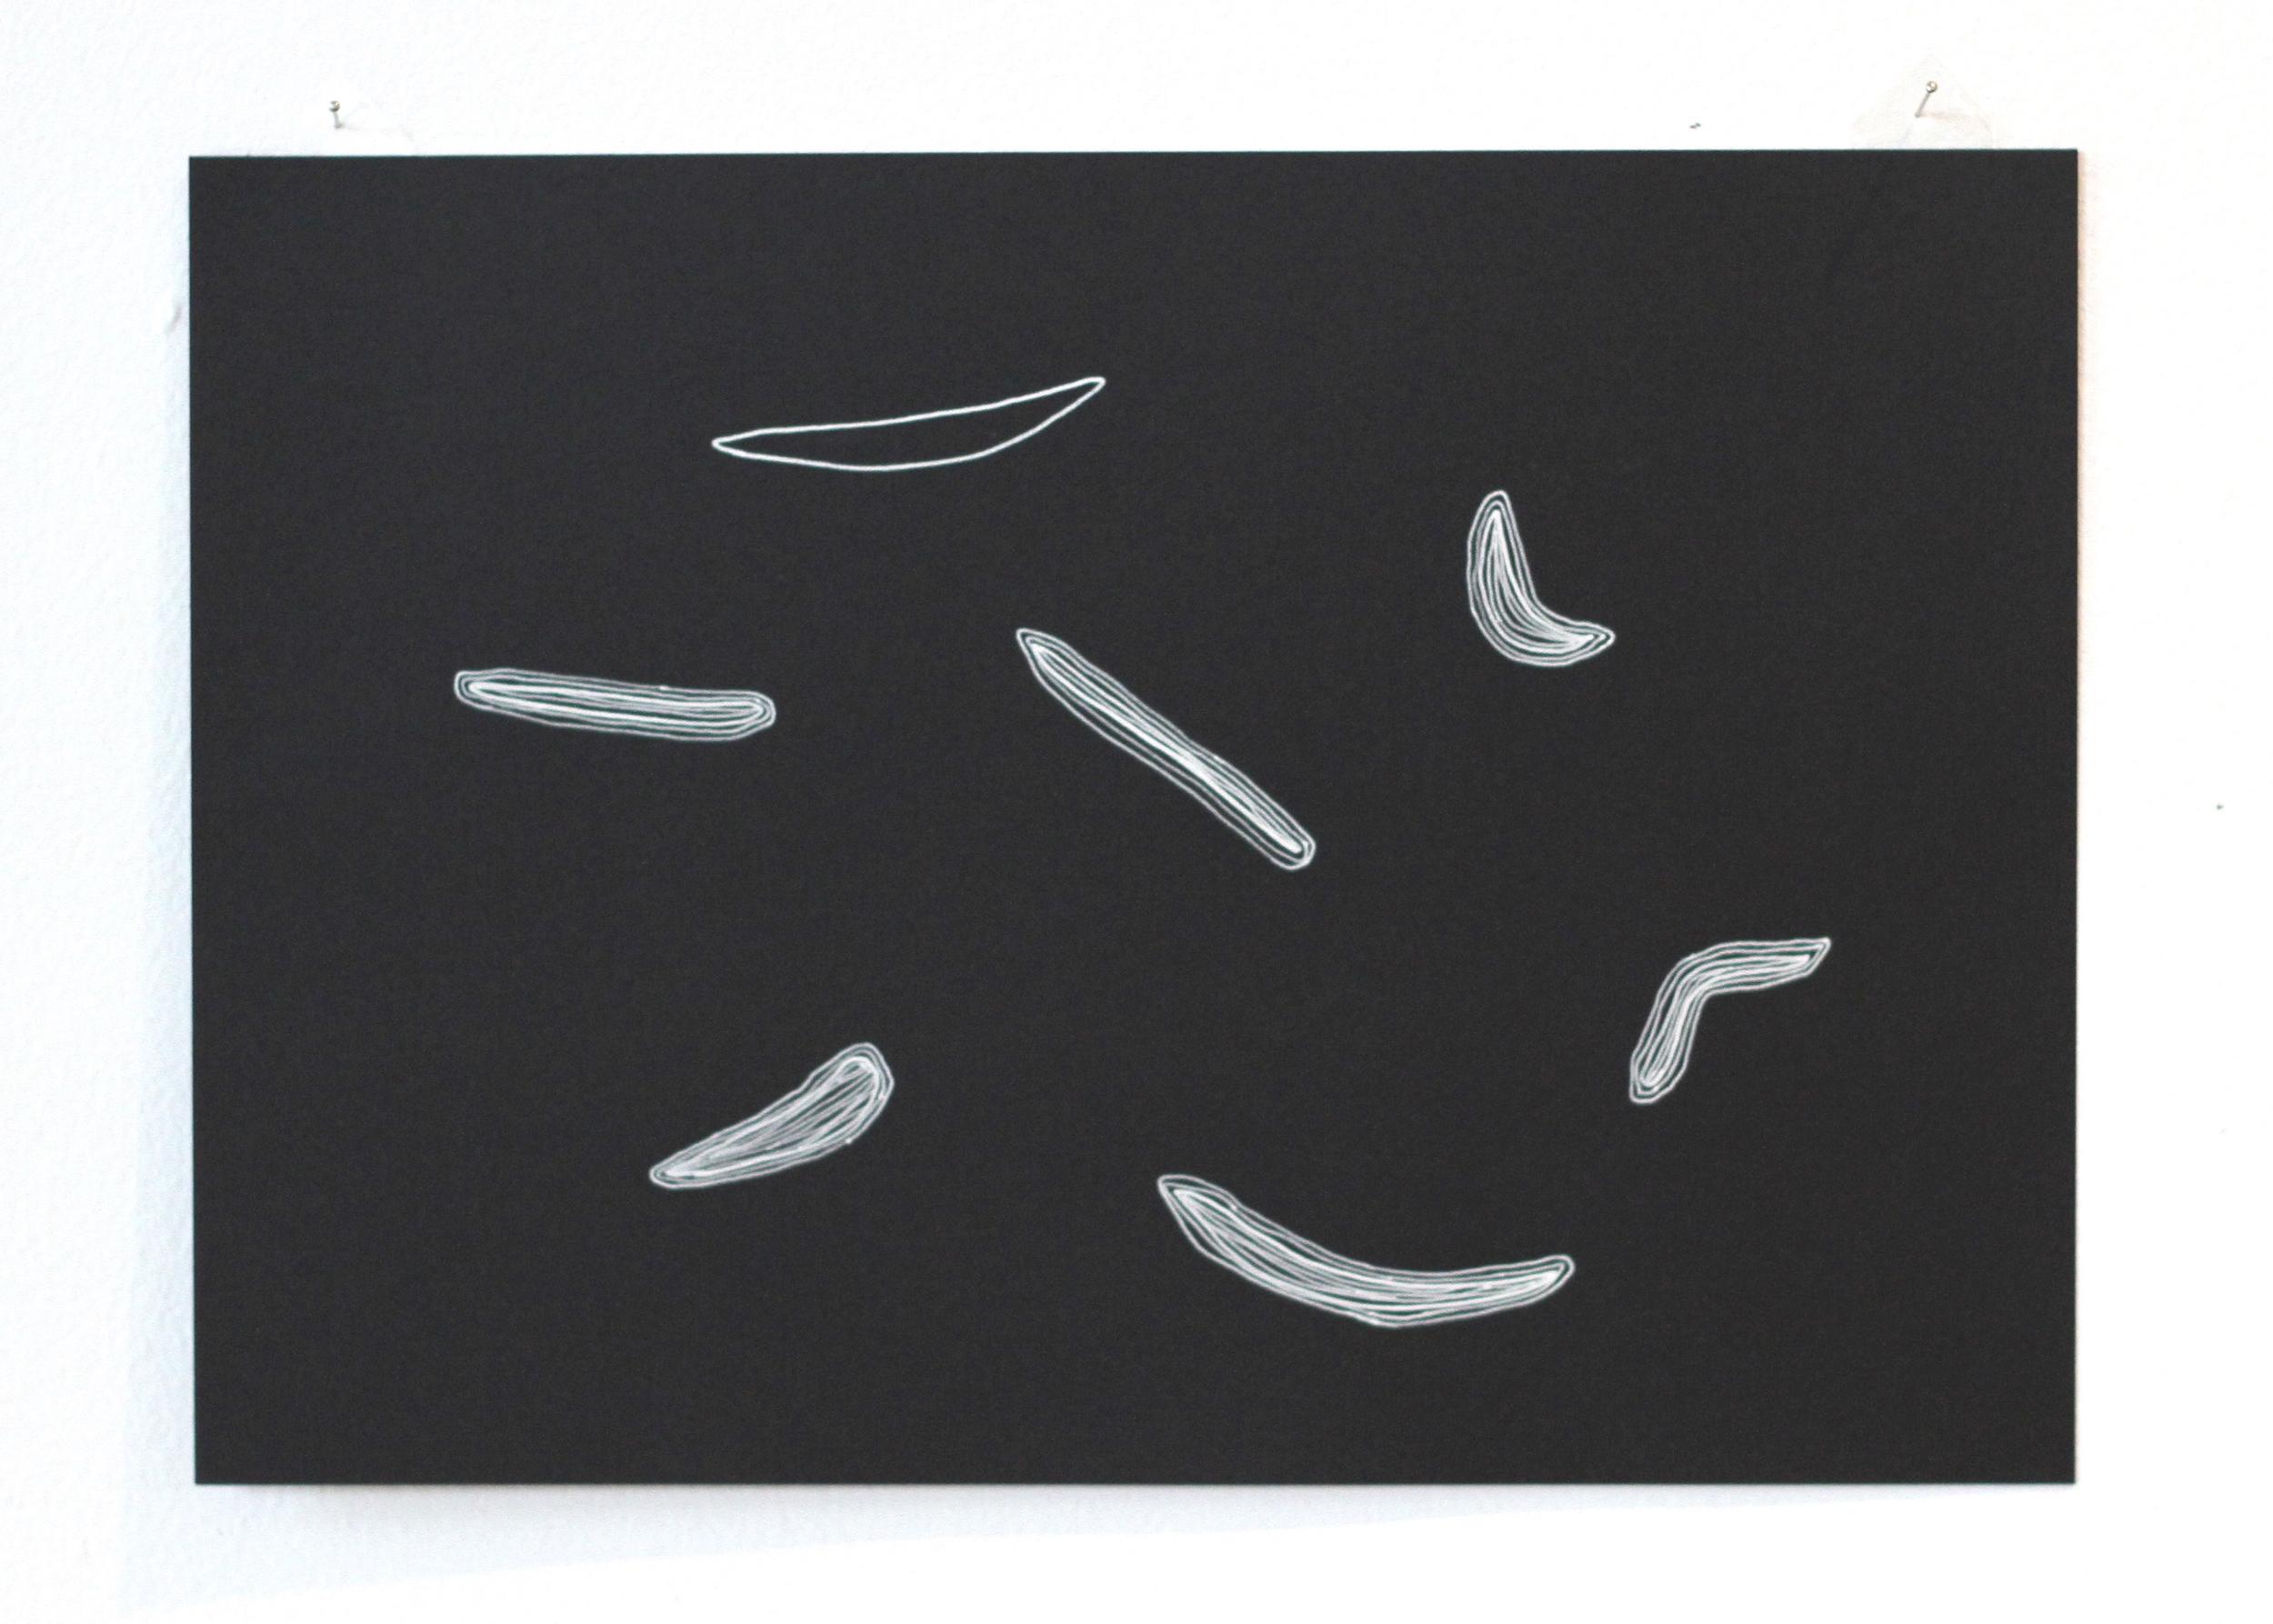 Ān fenjān hāye chāi ke bā ham nanooshidim / Those cups of tea we didn't share 1, Léuli Eshraghi, ink on card, 21 x 29.5cm, 2014